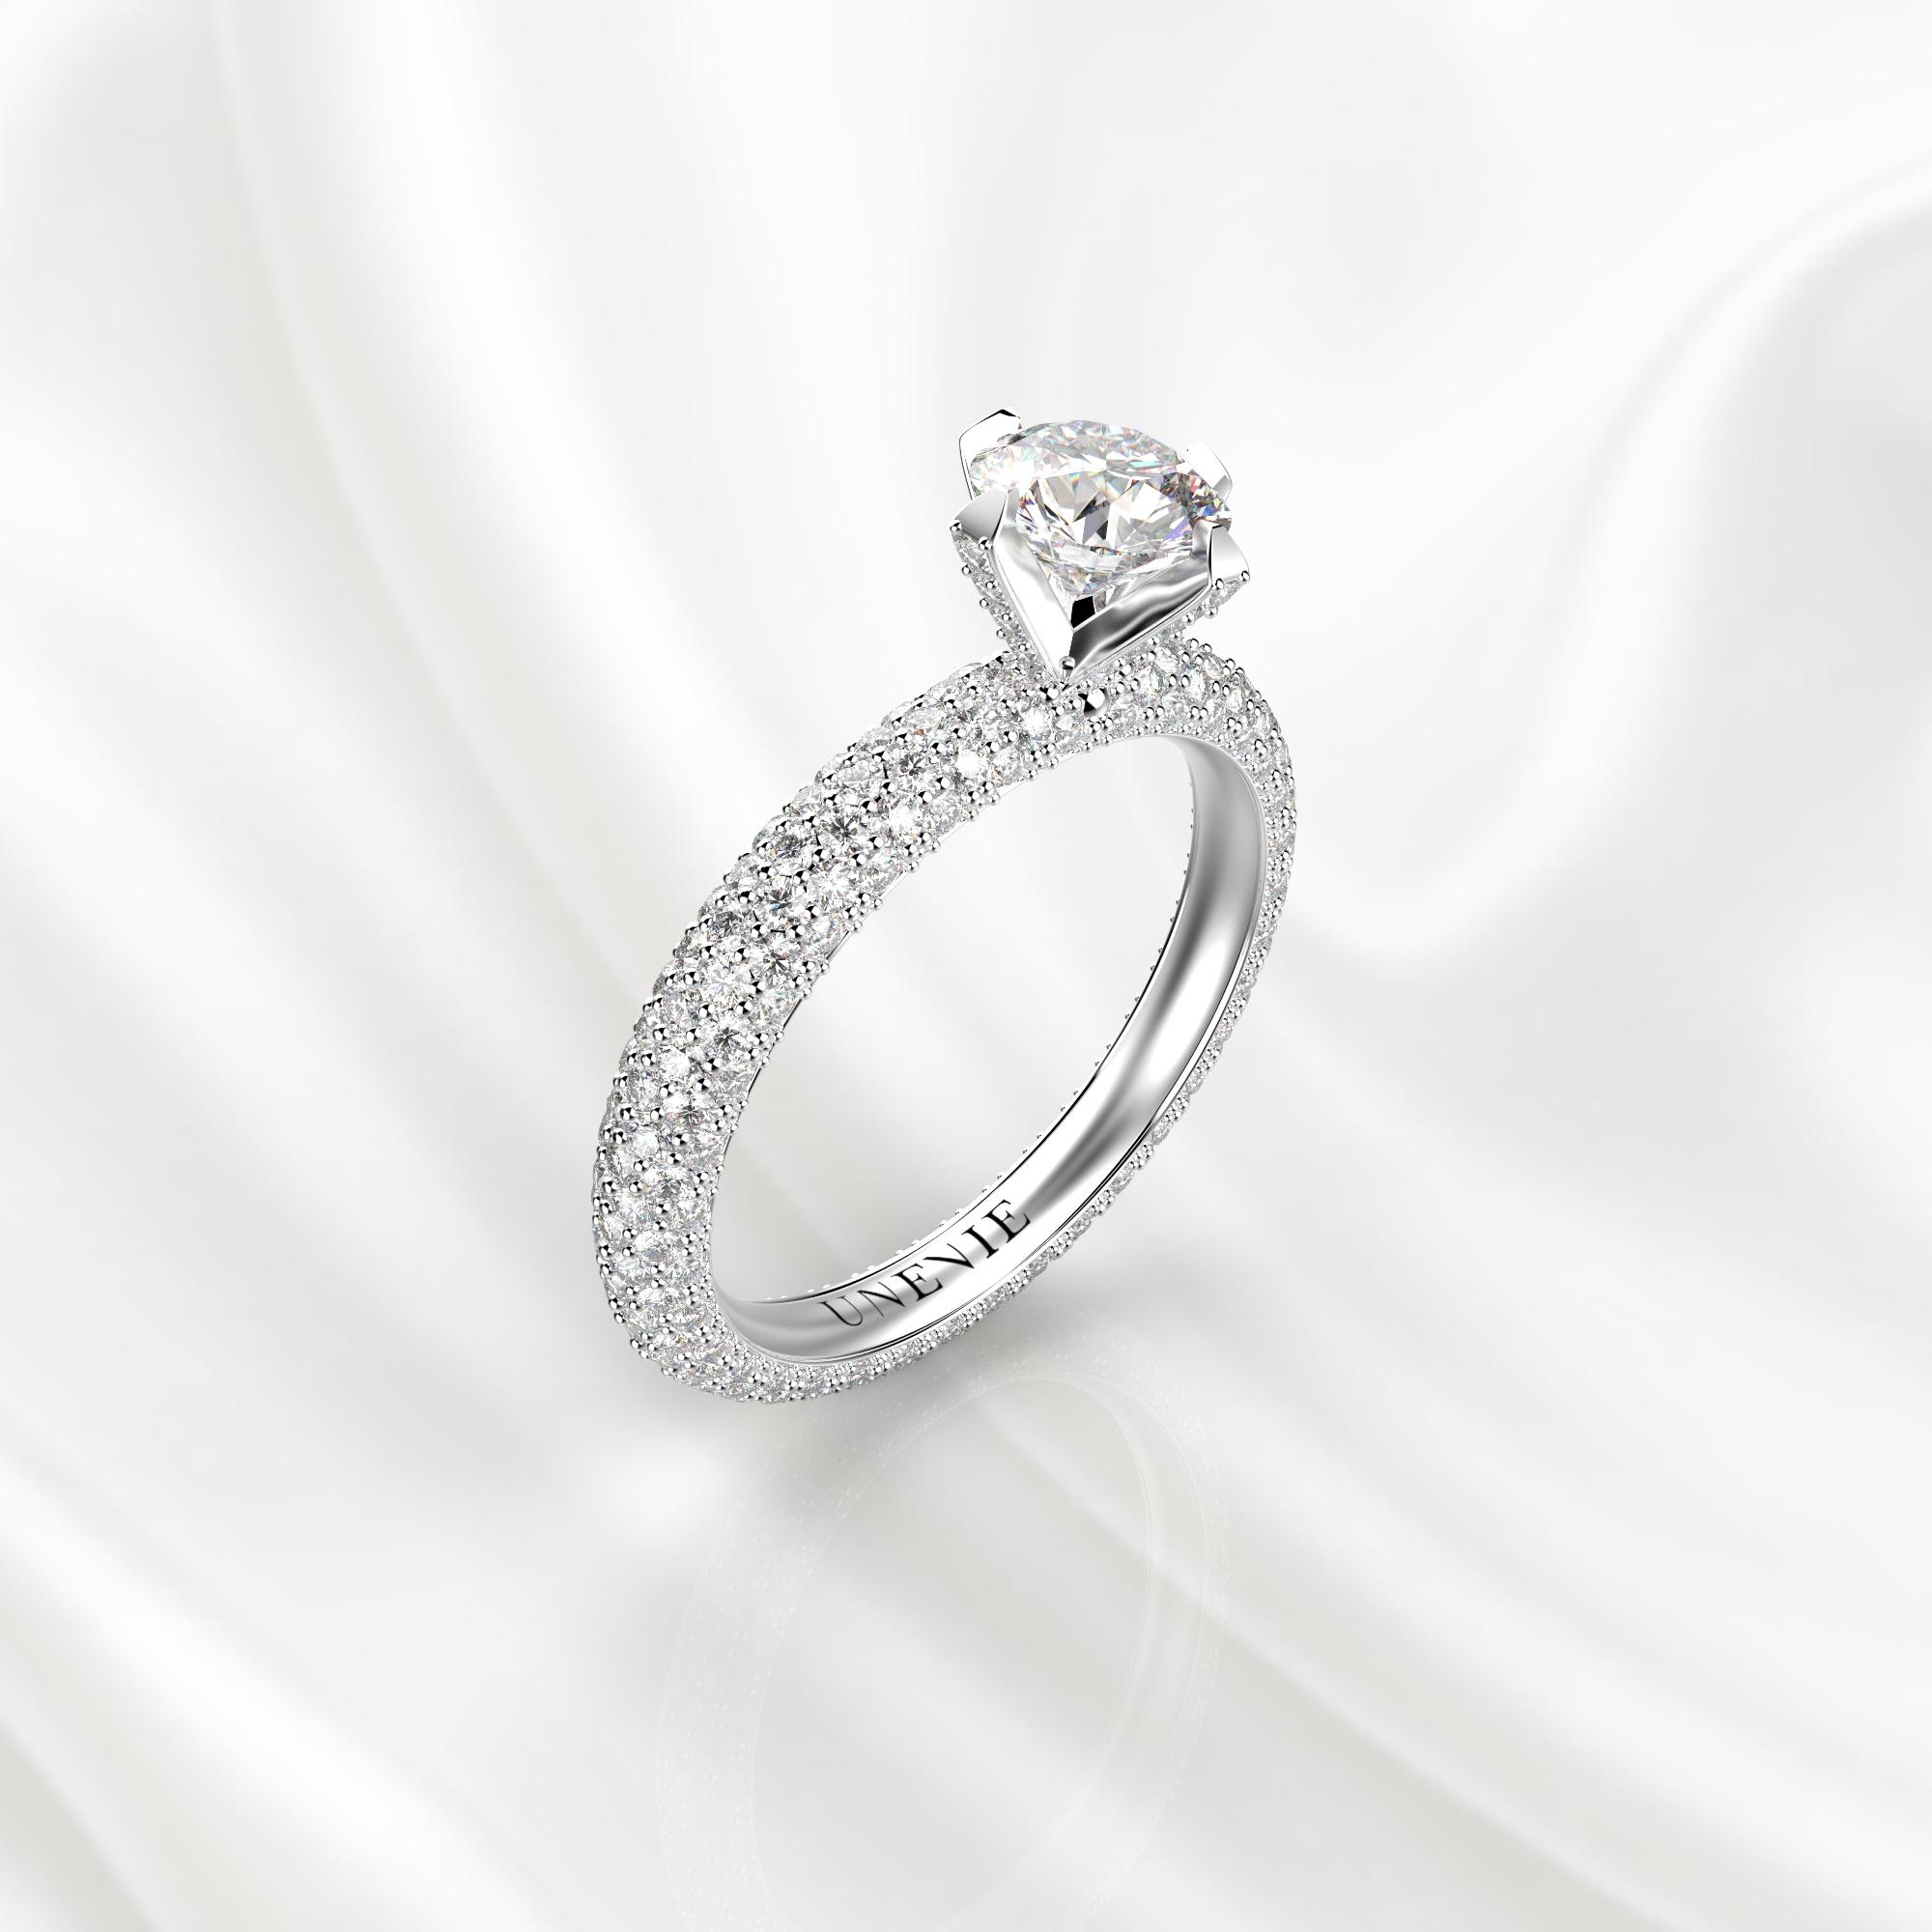 N25 Помолвочное кольцо из белого золота с бриллиантами